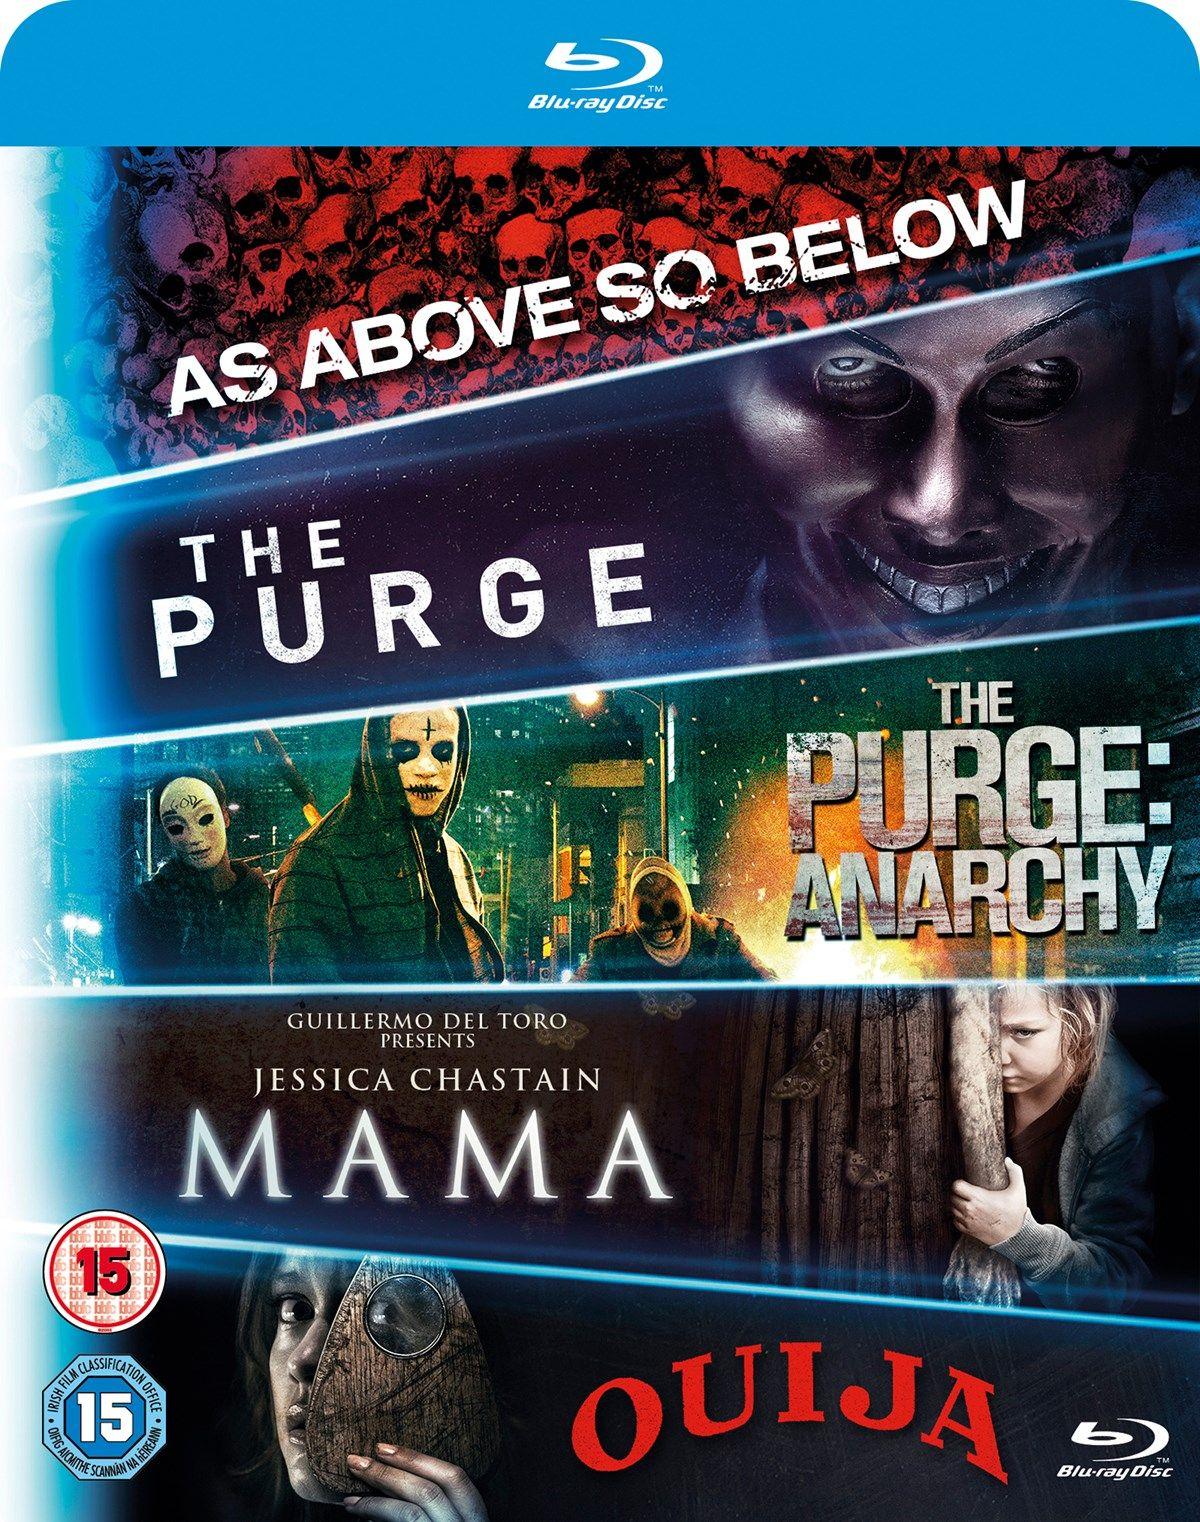 Mama/The Purge/The Purge Anarchy/Ouija/As Above So Below Blu Ray box set £10 @ zoom